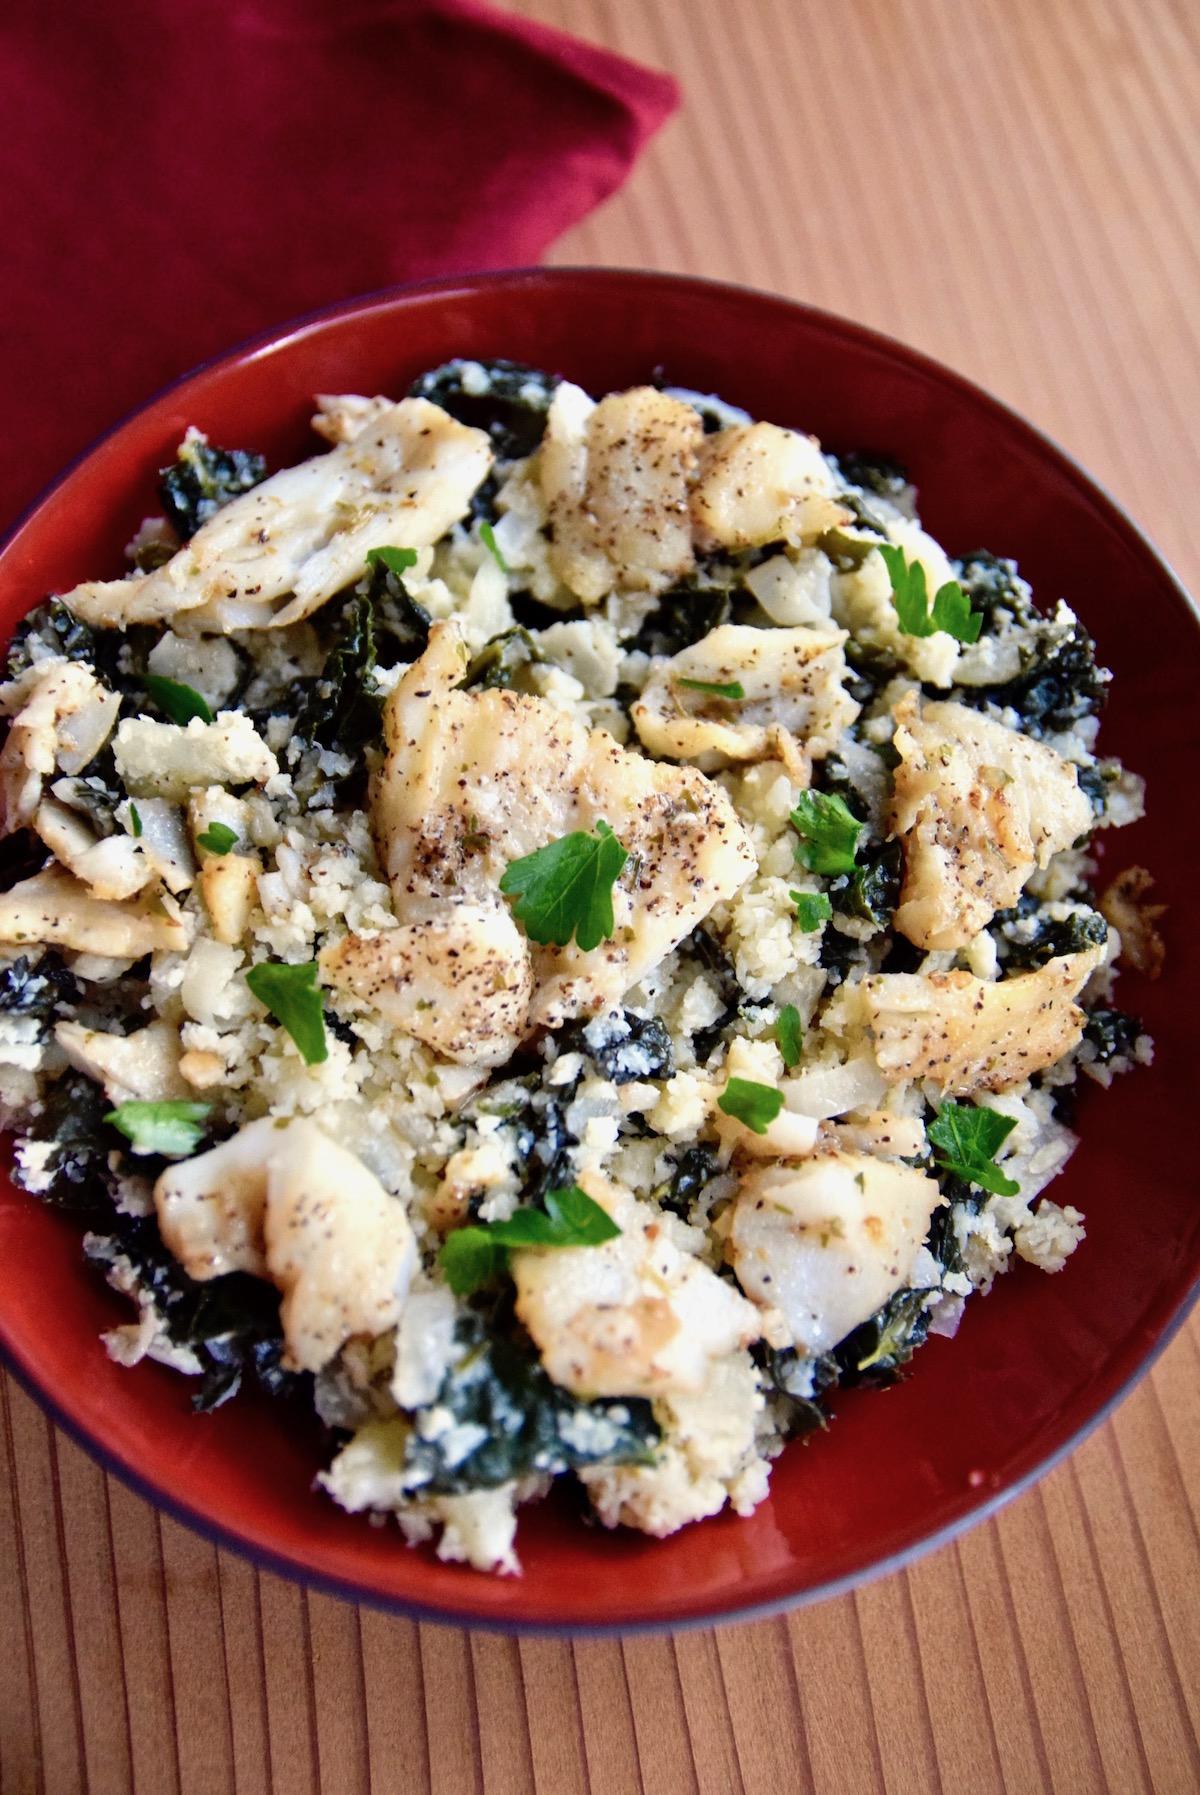 Cauliflower kale cod bowl - gluten free, dairy free, paleo recipe | TastingPage.com